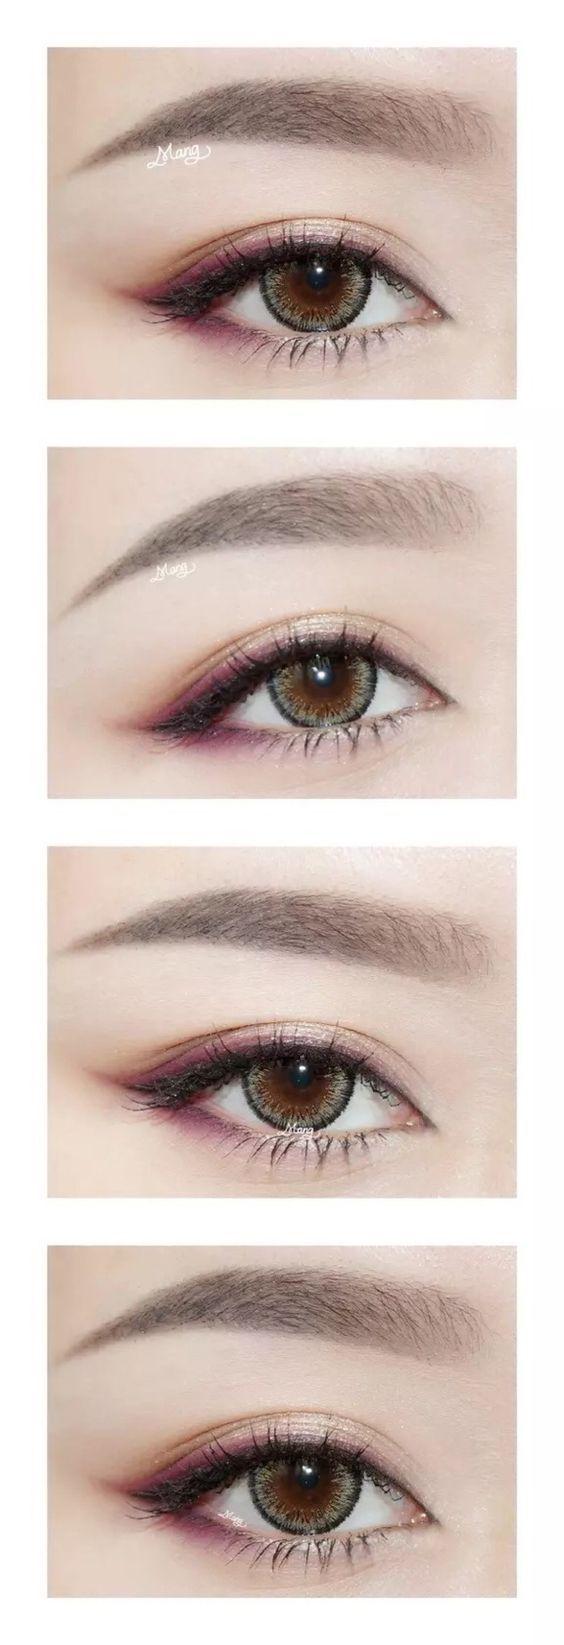 Sexy Eye Makeup #make up #idea Beauty & Personal Care  Makeup  Eyes  Eyeshad